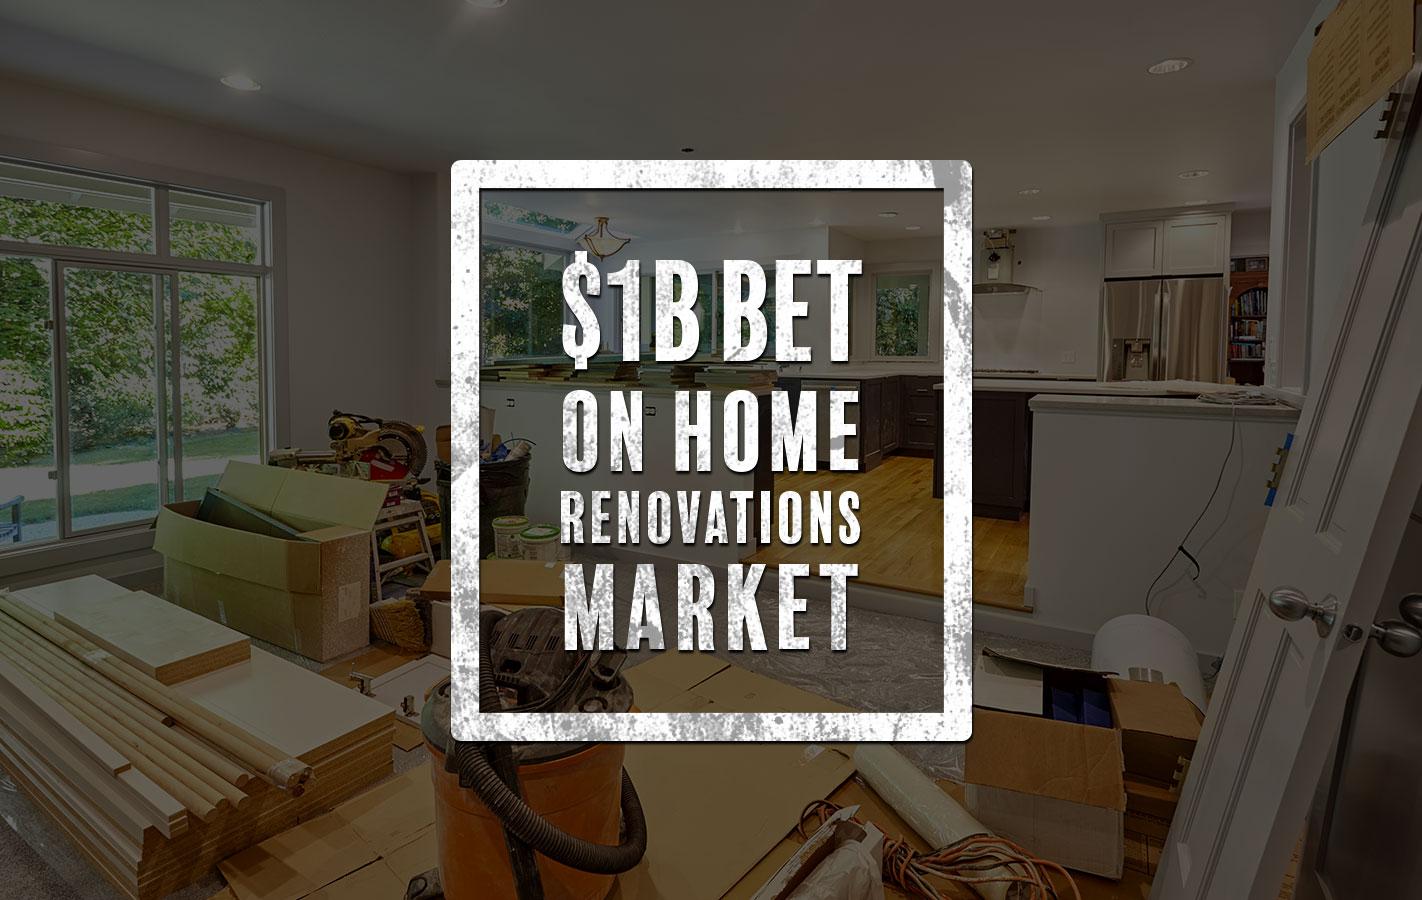 Renovations market bet